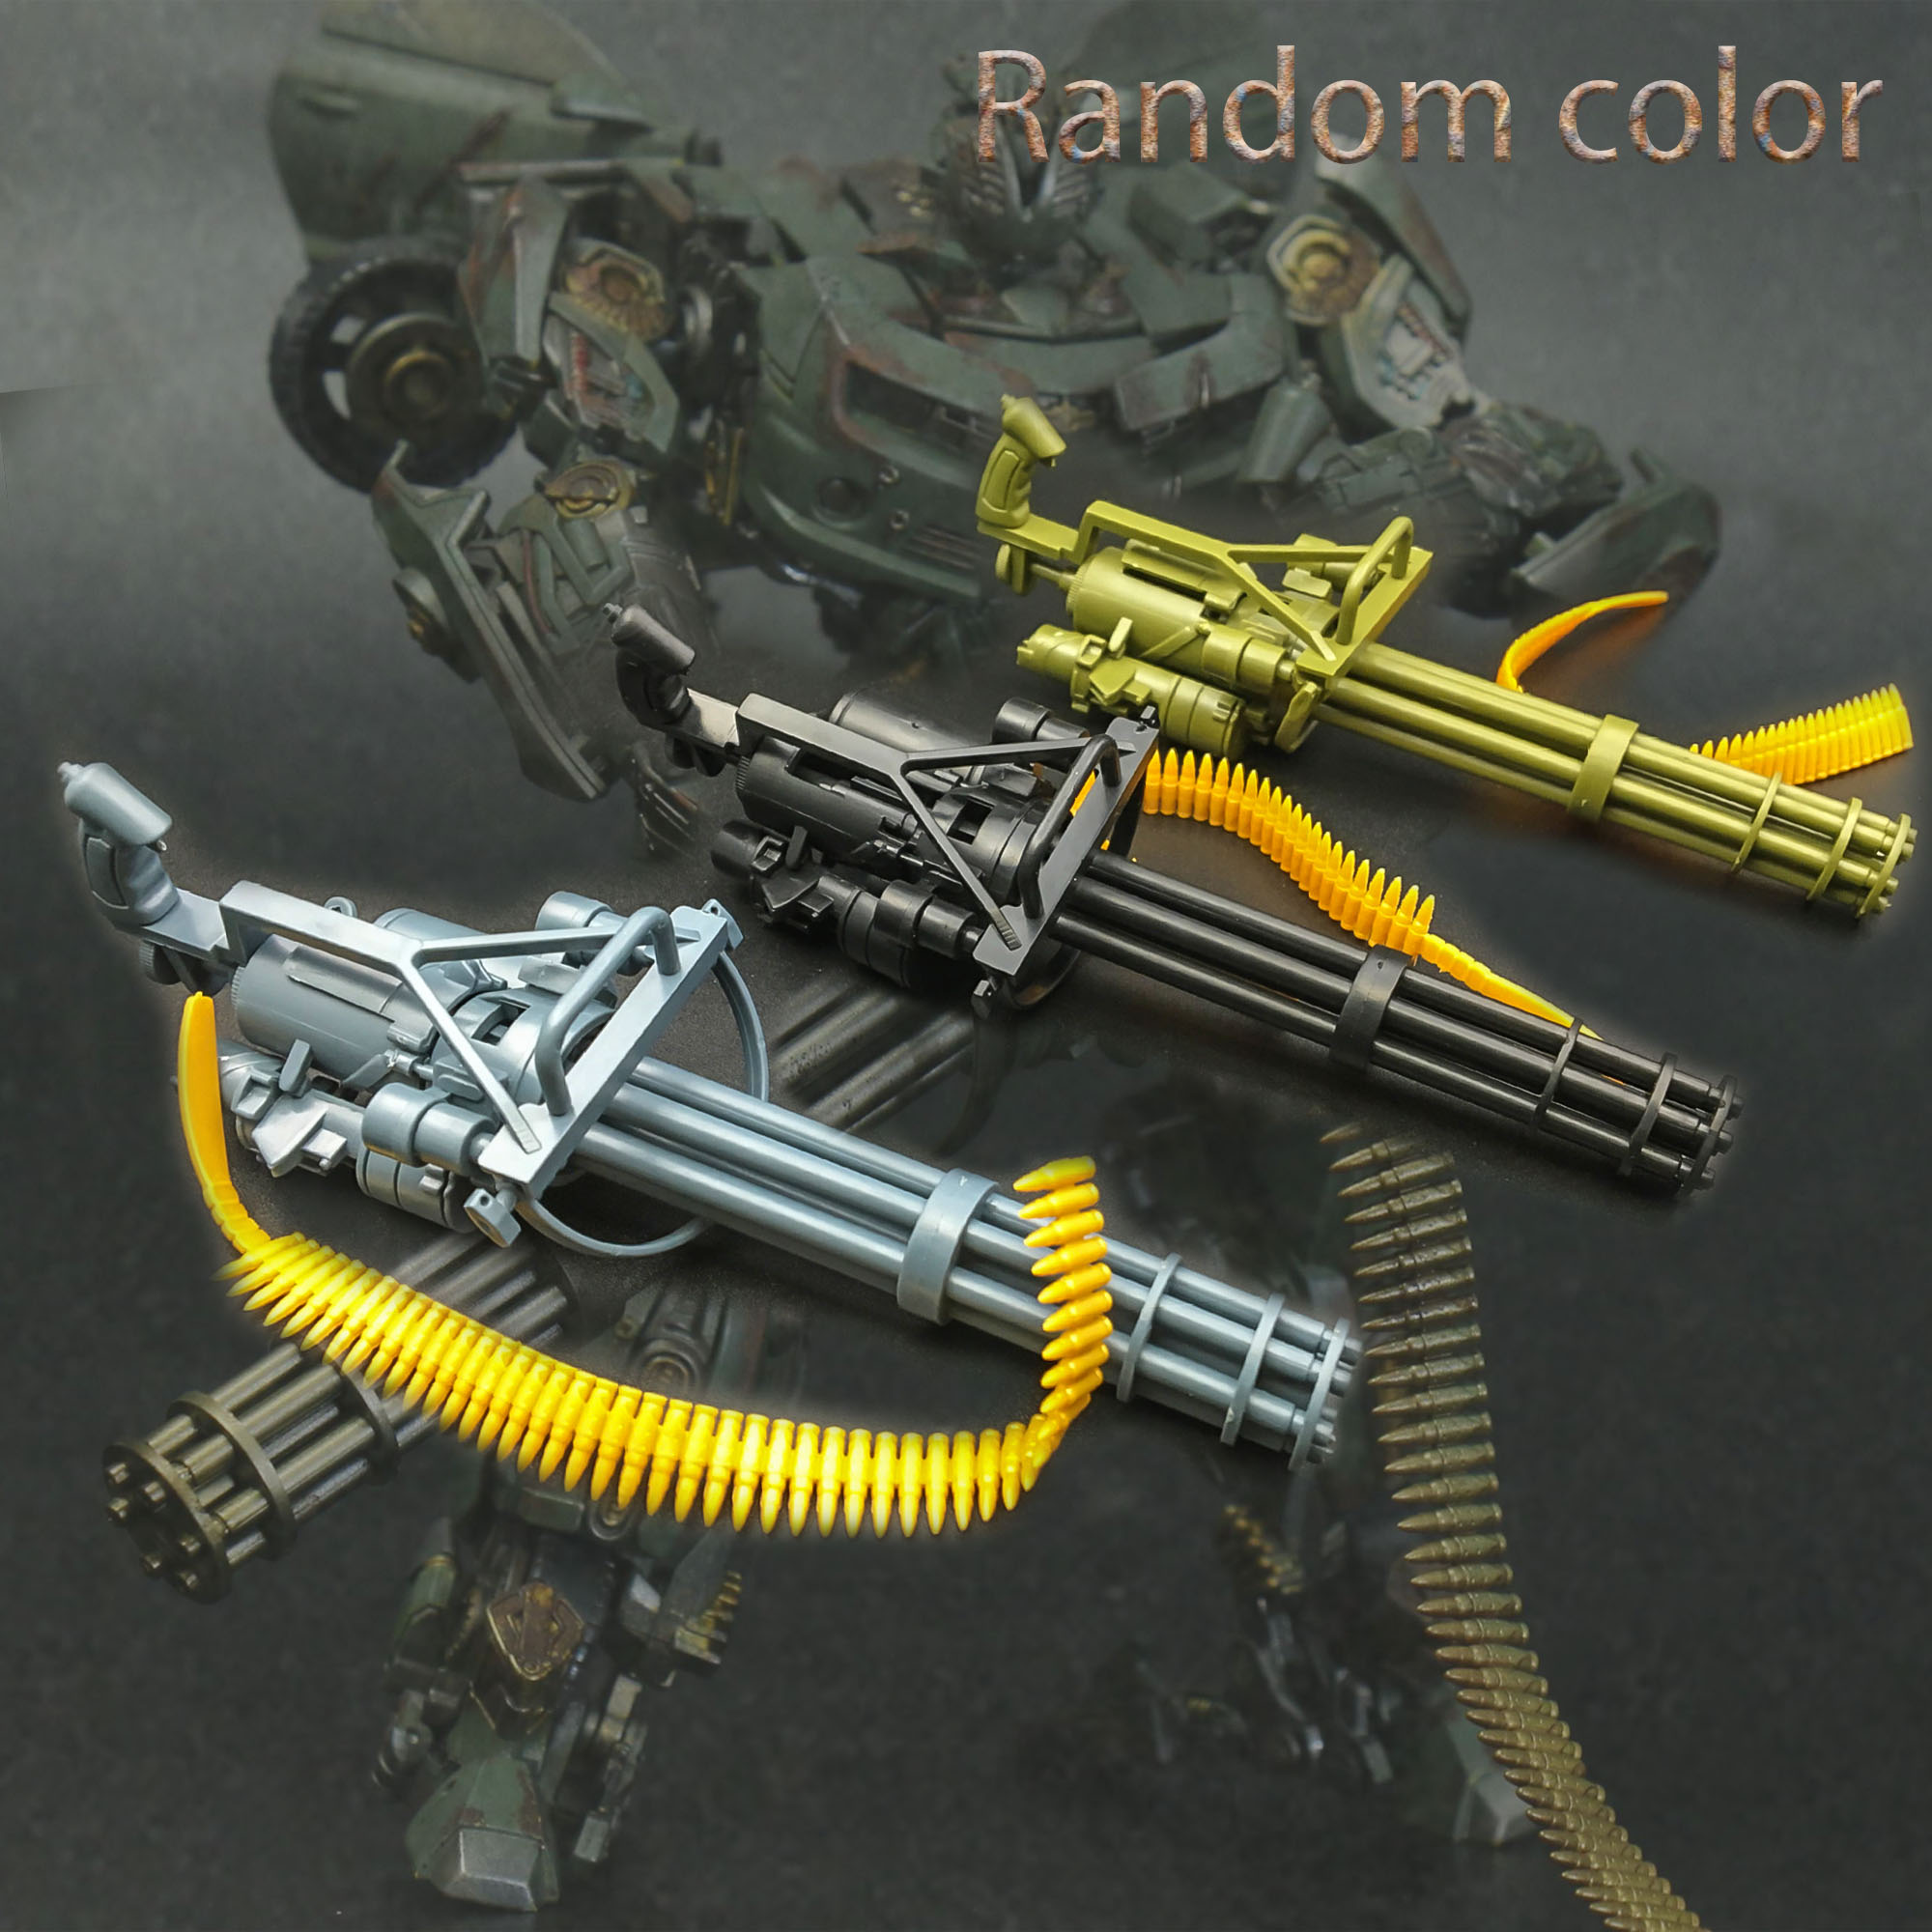 1/6 Scale Gatling M134 Toy Gun Model Puzzles Building Bricks Gun Soldier Weapon